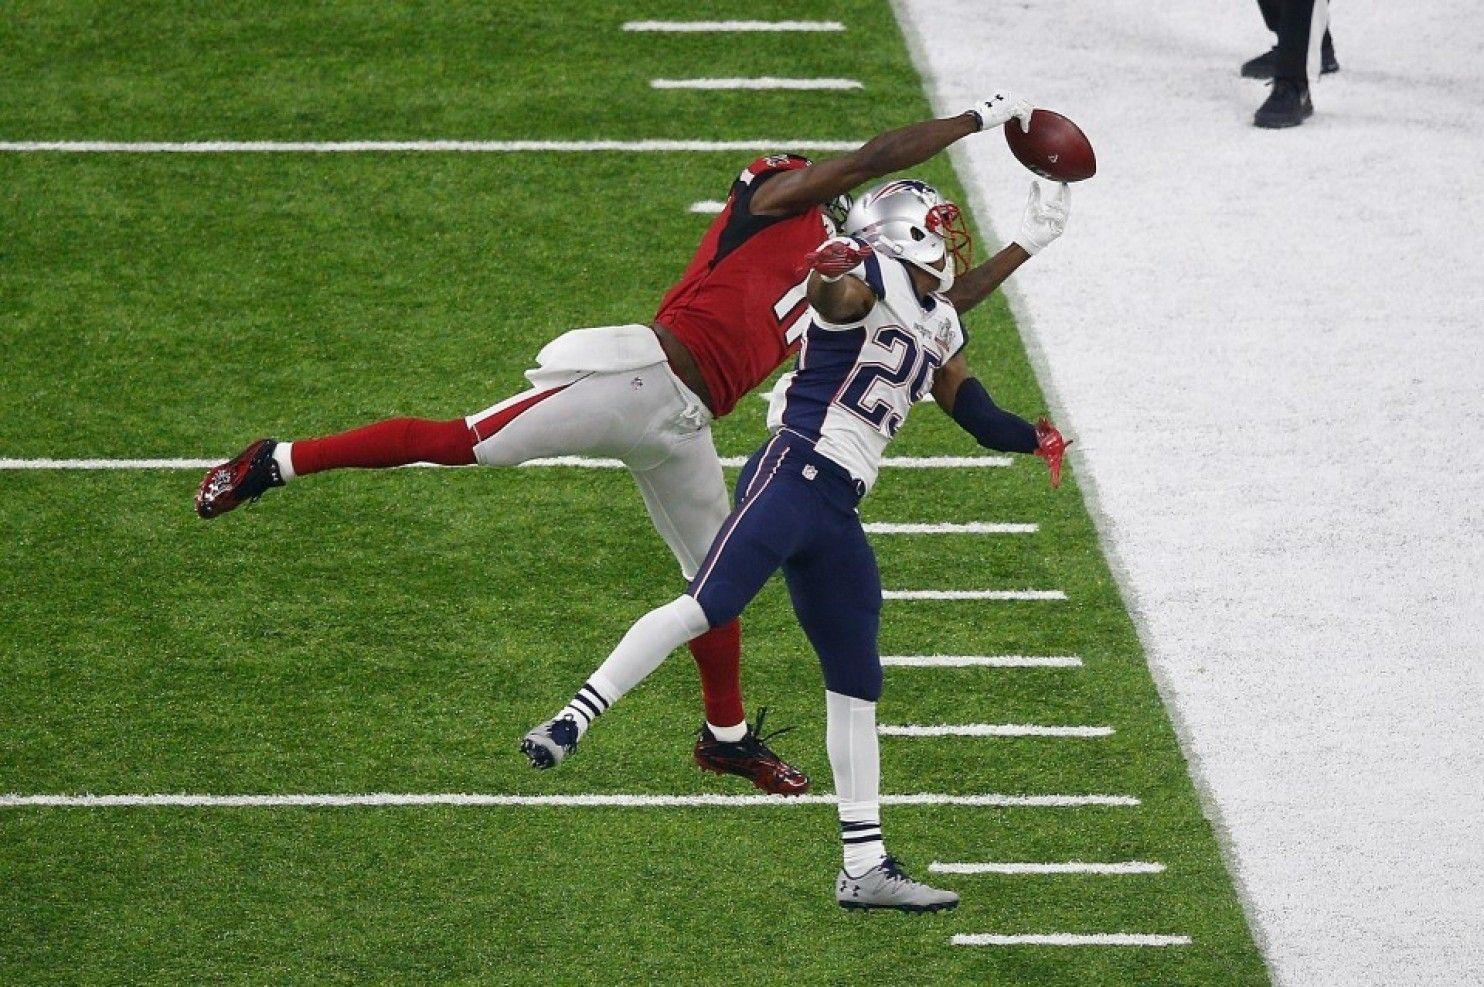 Julio Jones Made An Iconic Catch Then The Falcons Blew The Super Bowl Julio Jones Bama Football Super Bowl